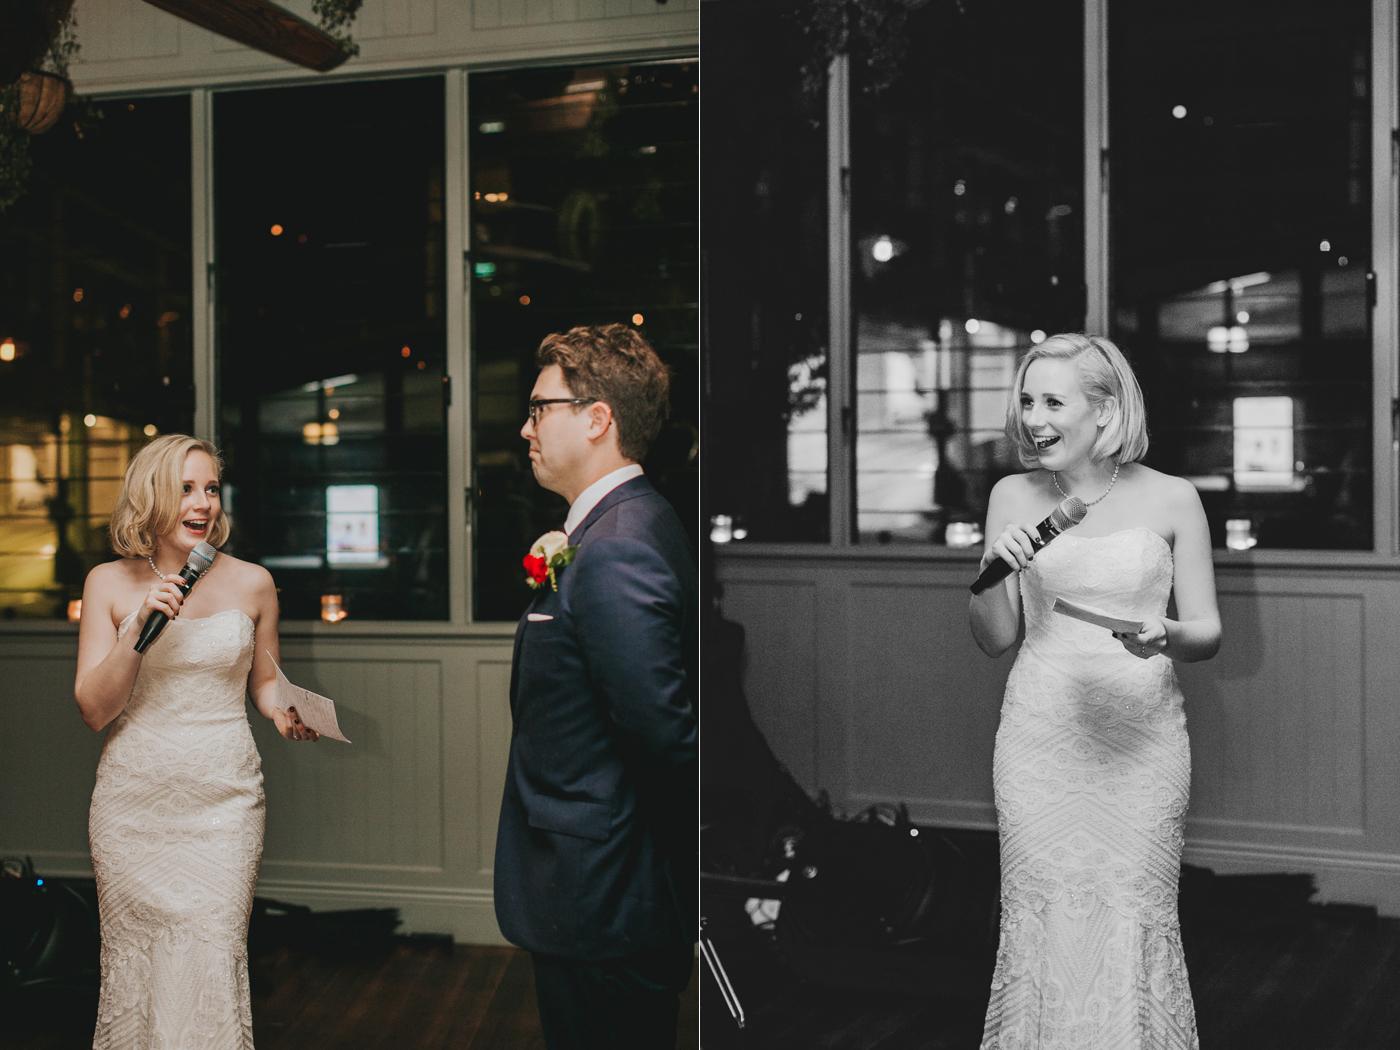 Jo & Tom Wedding - The Grounds of Alexandria - Samantha Heather Photography-349.jpg